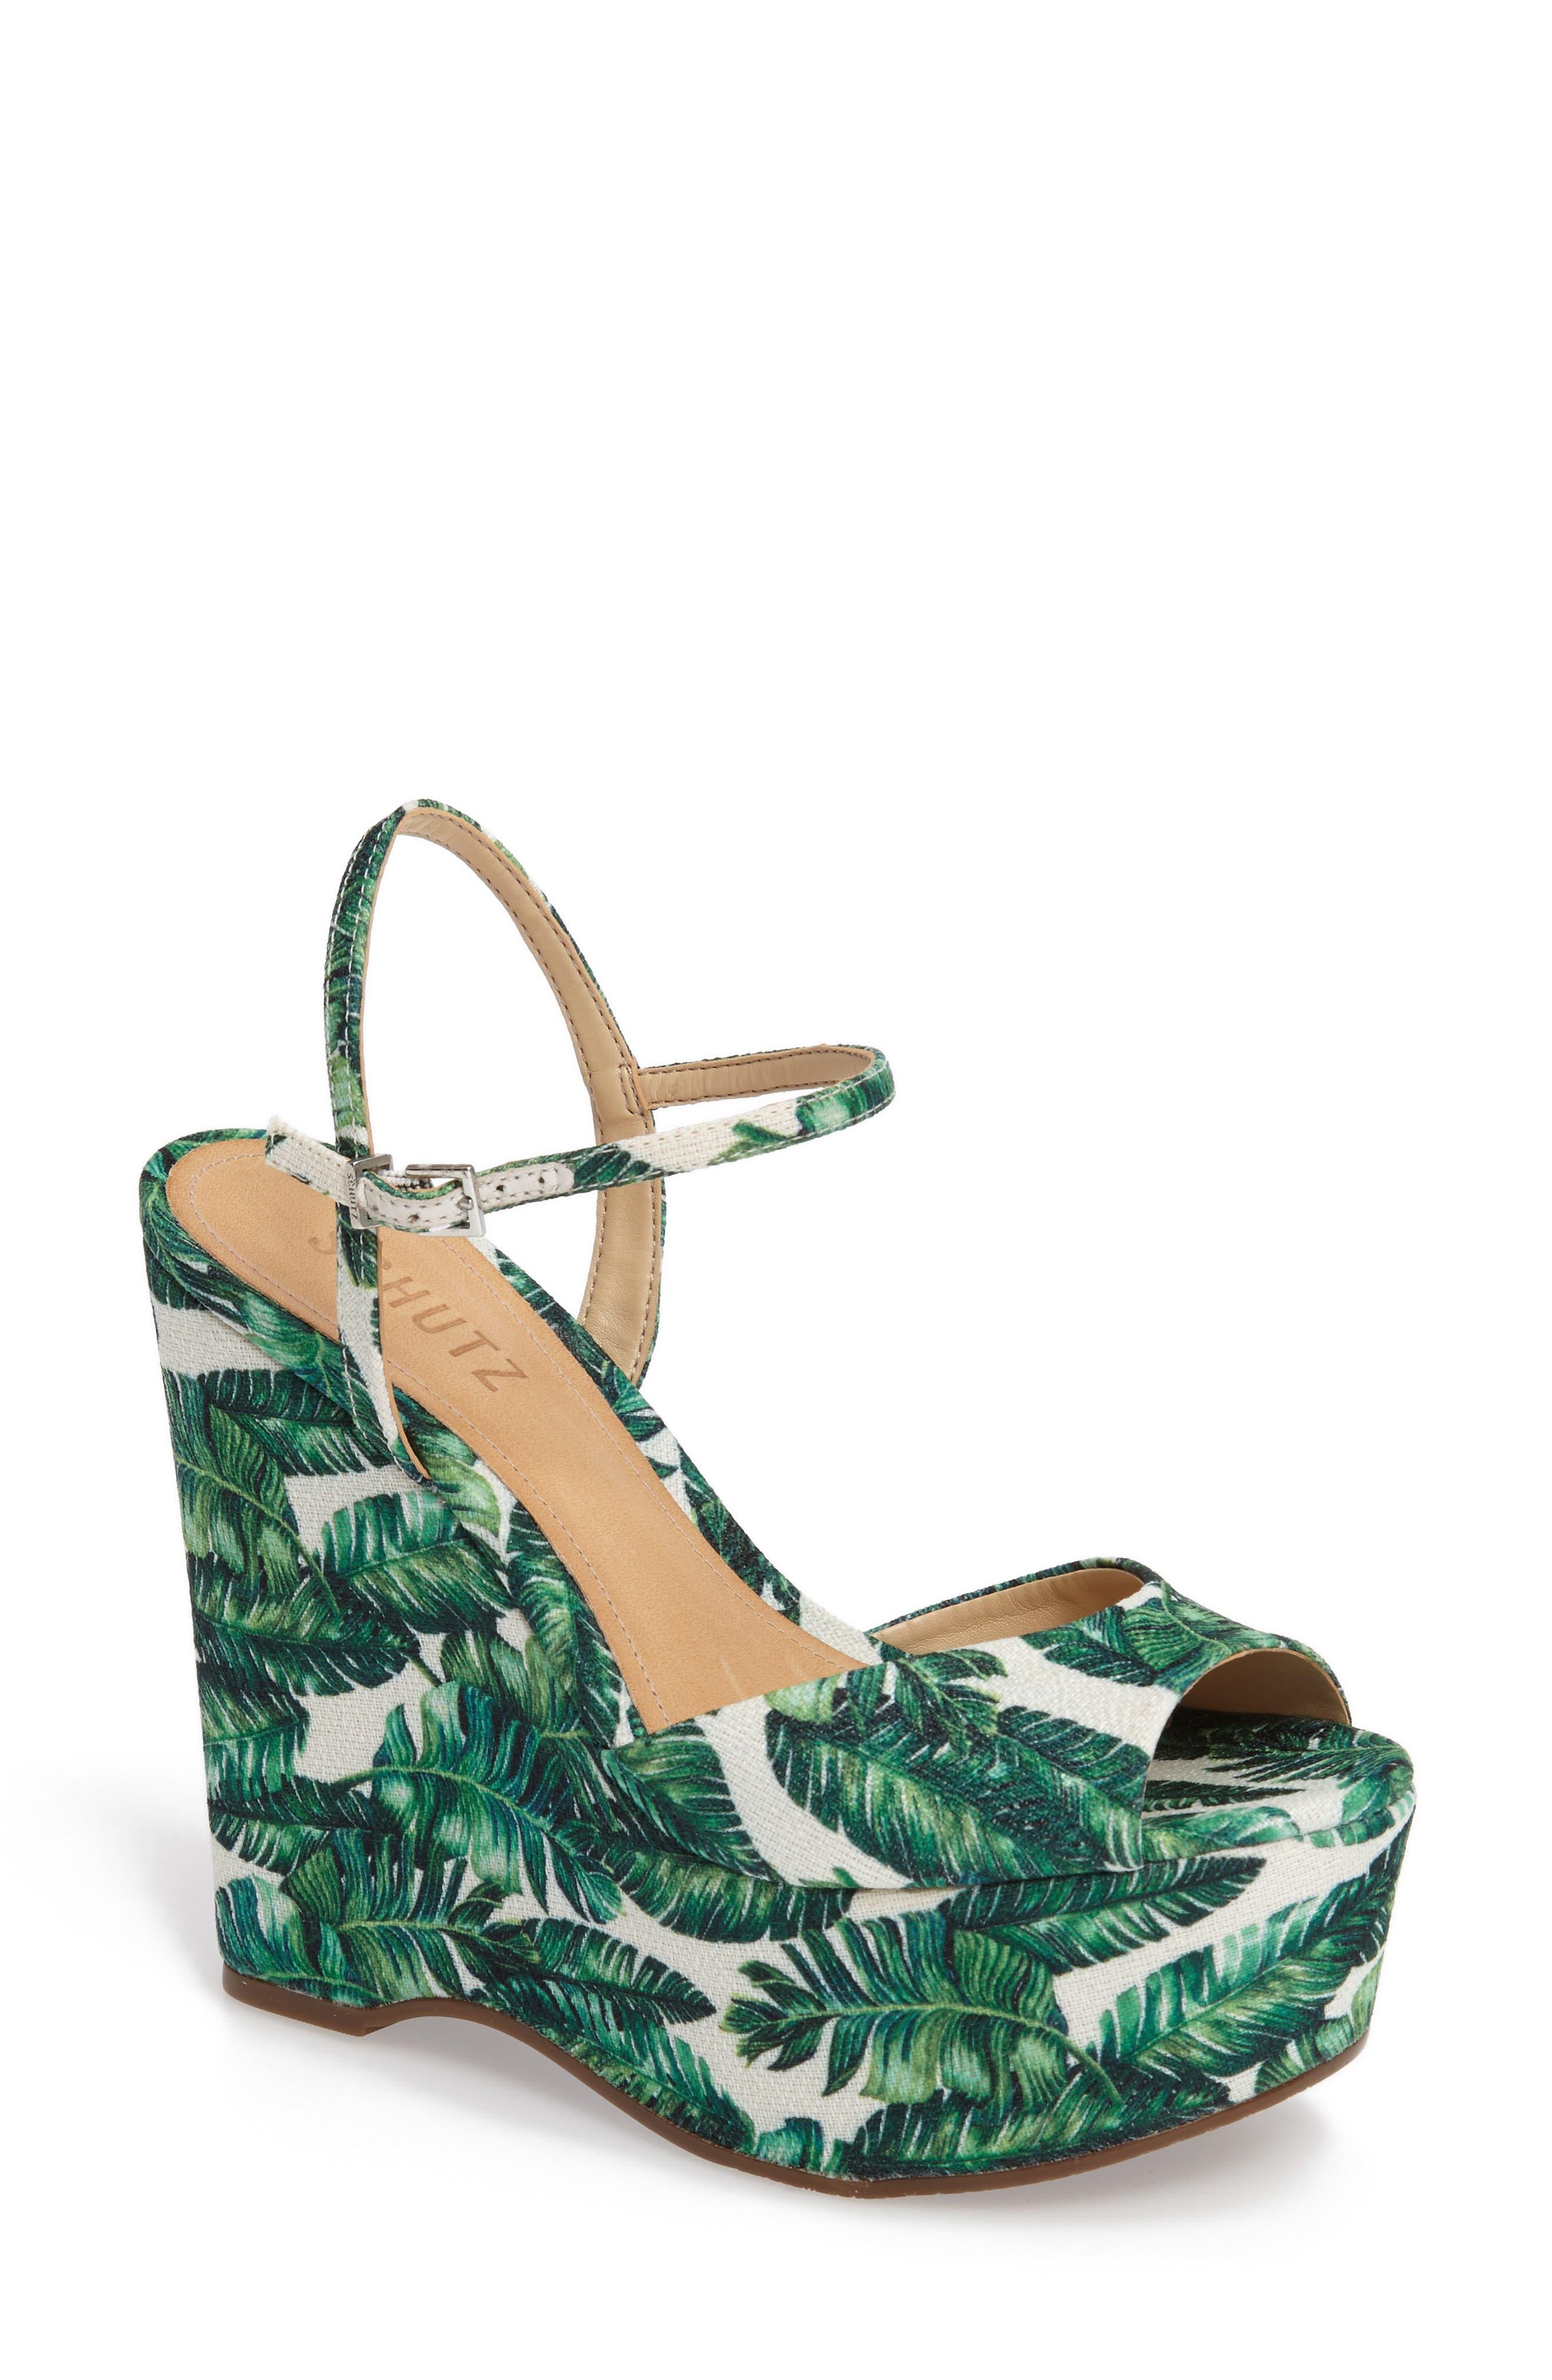 Main Image - Schutz Patrycia Wedge Sandal (Women)